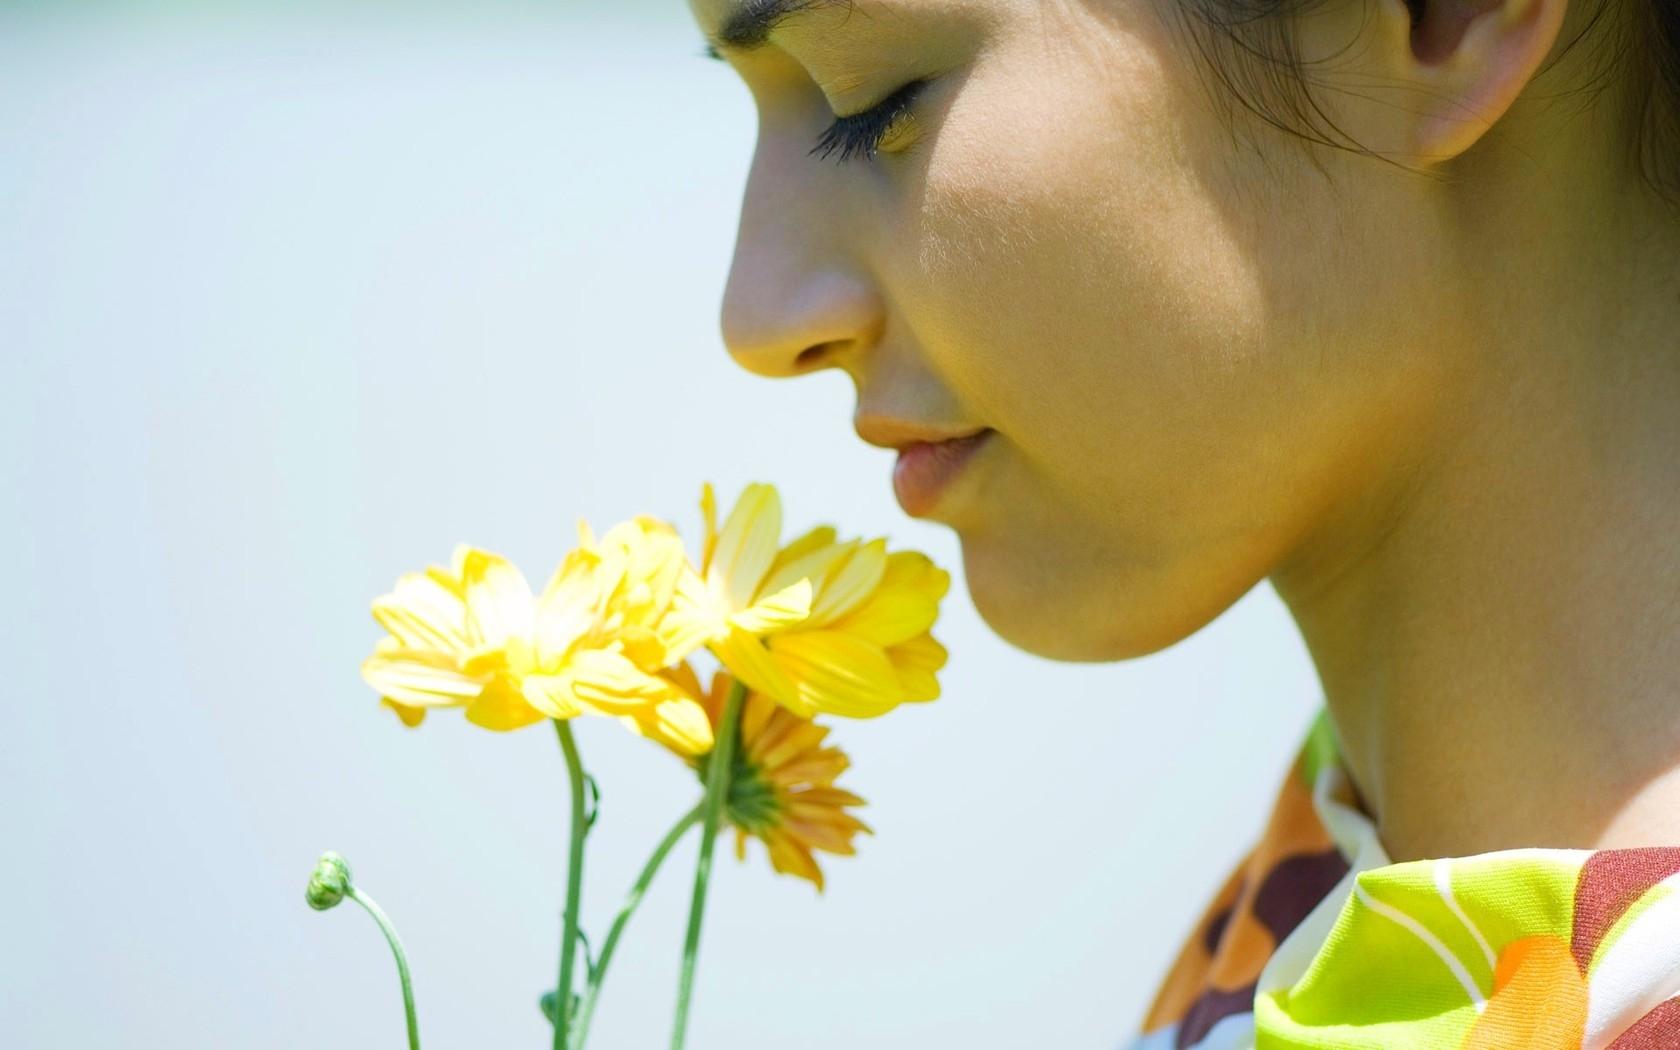 flower_girl_smell_breath_69996_1680x1050